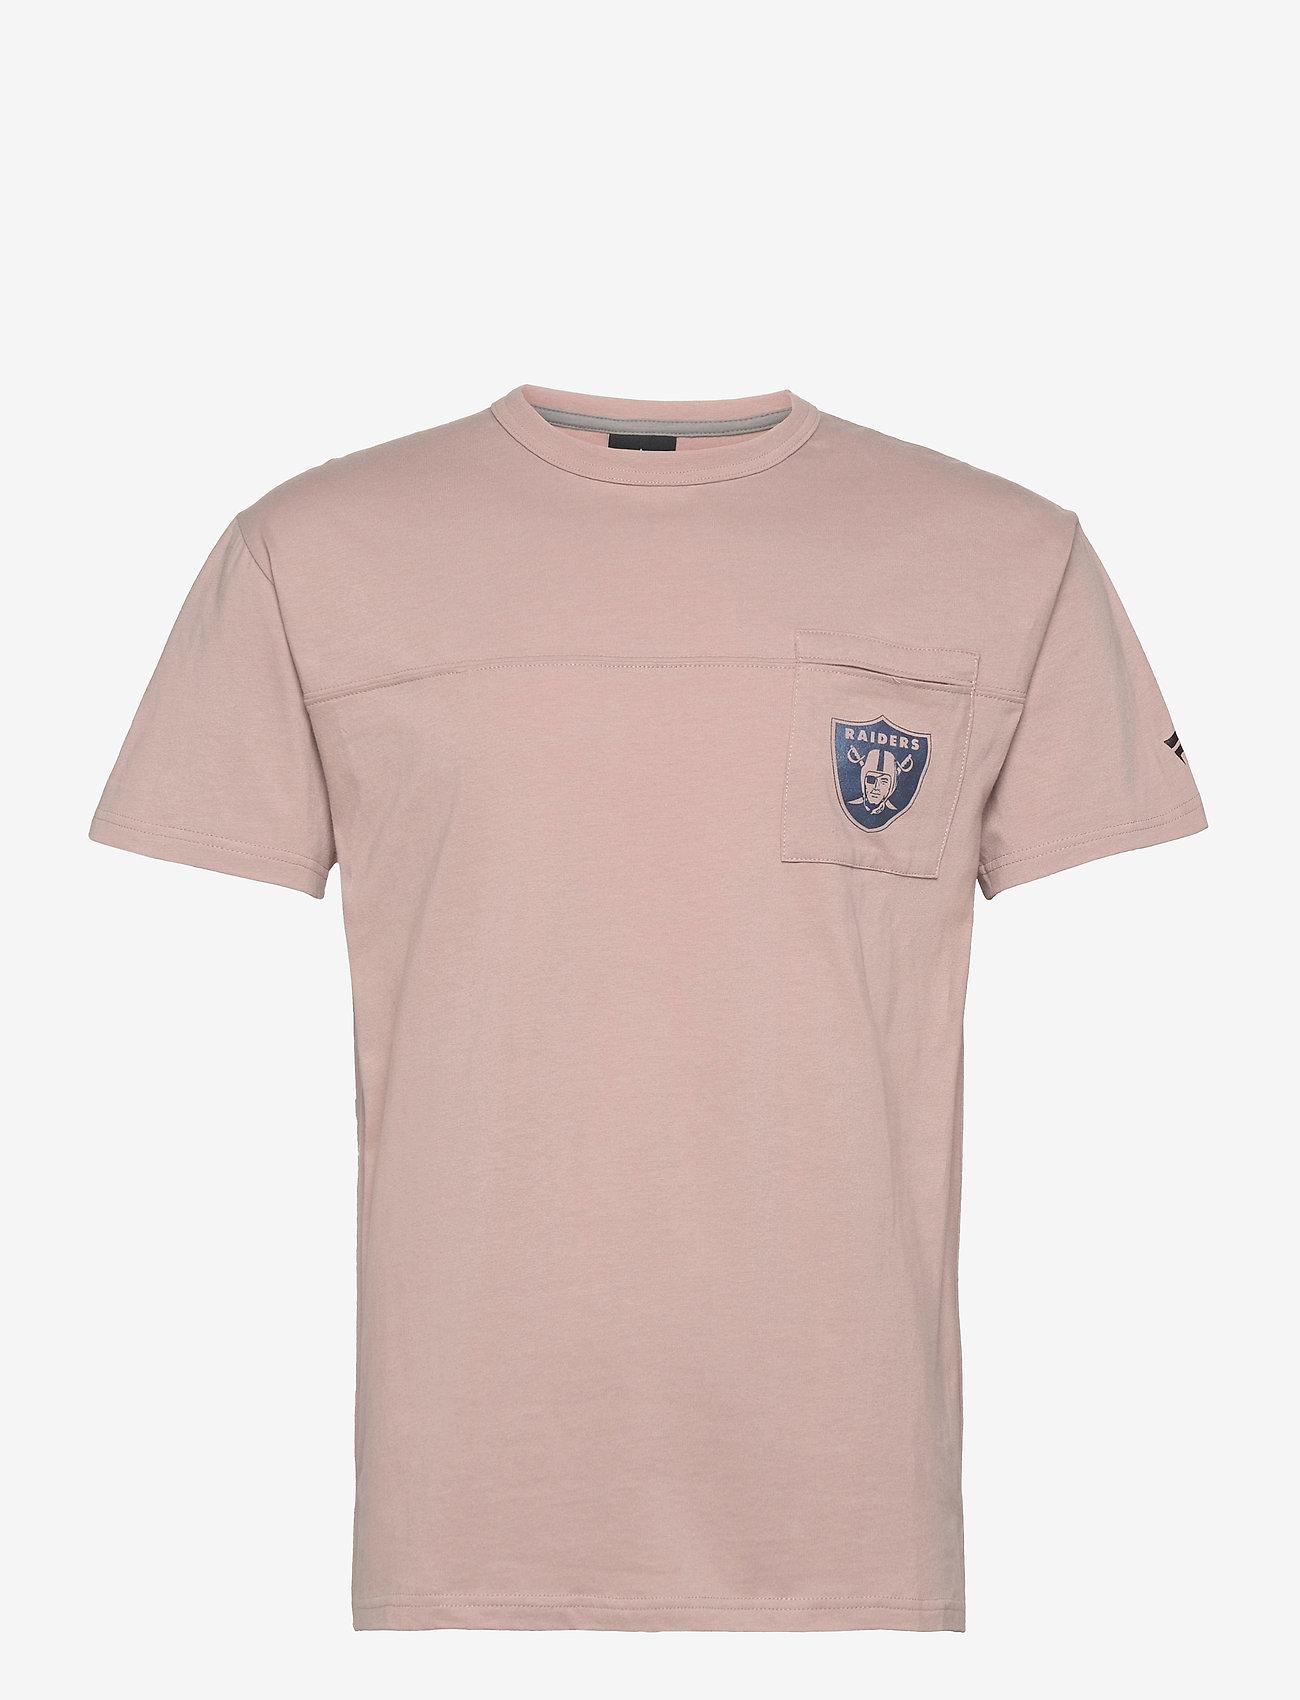 Fanatics - Las Vegas Raiders Diffusion SS21 T-Shirt - t-shirts - bark - 0